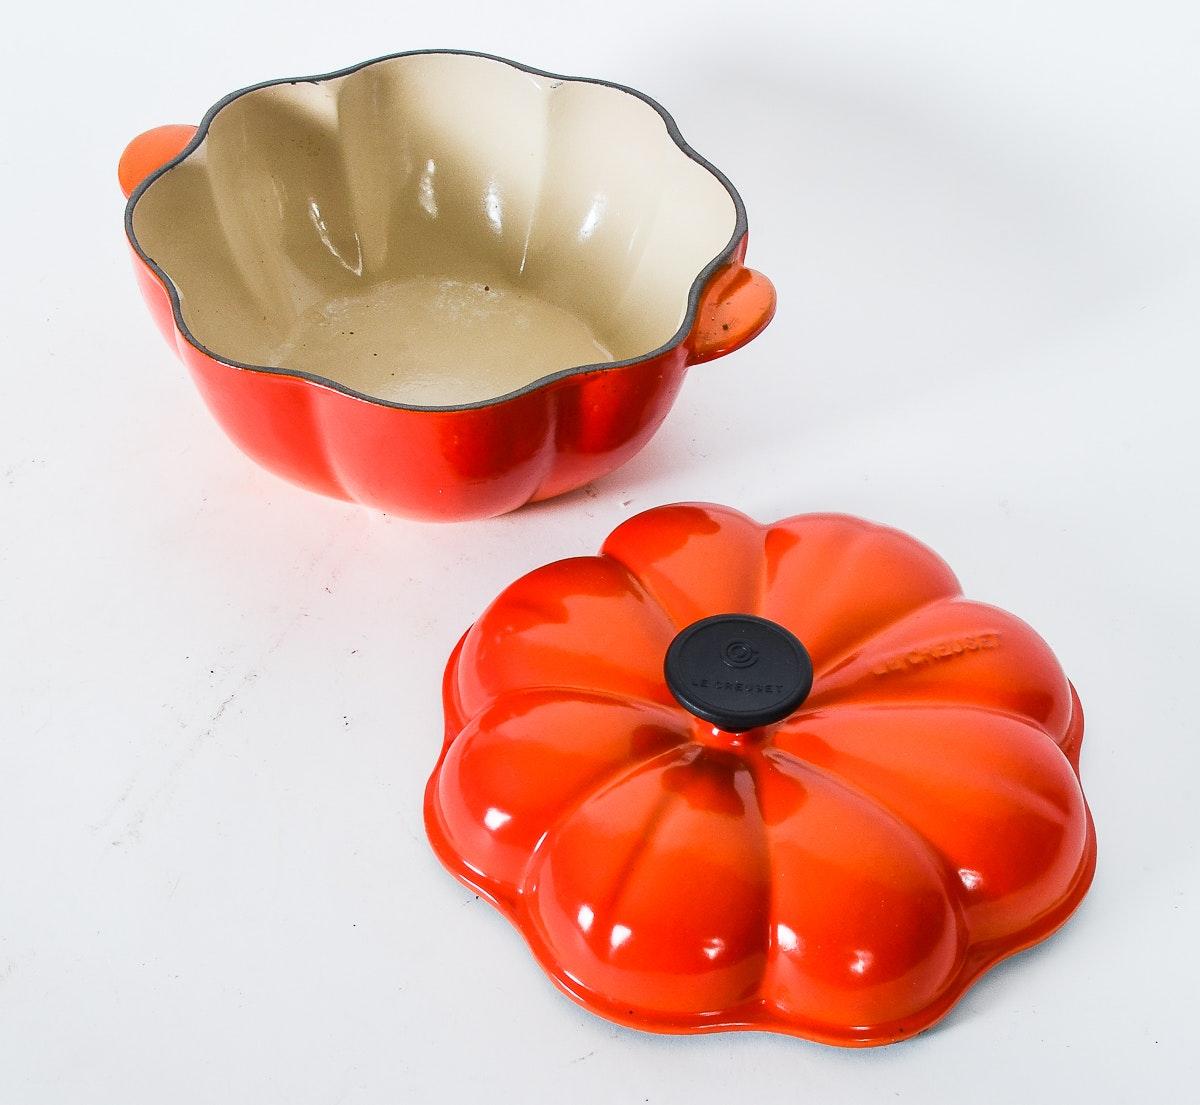 Rare Le Creuset Pumpkin Shaped Dutch Oven Ebth